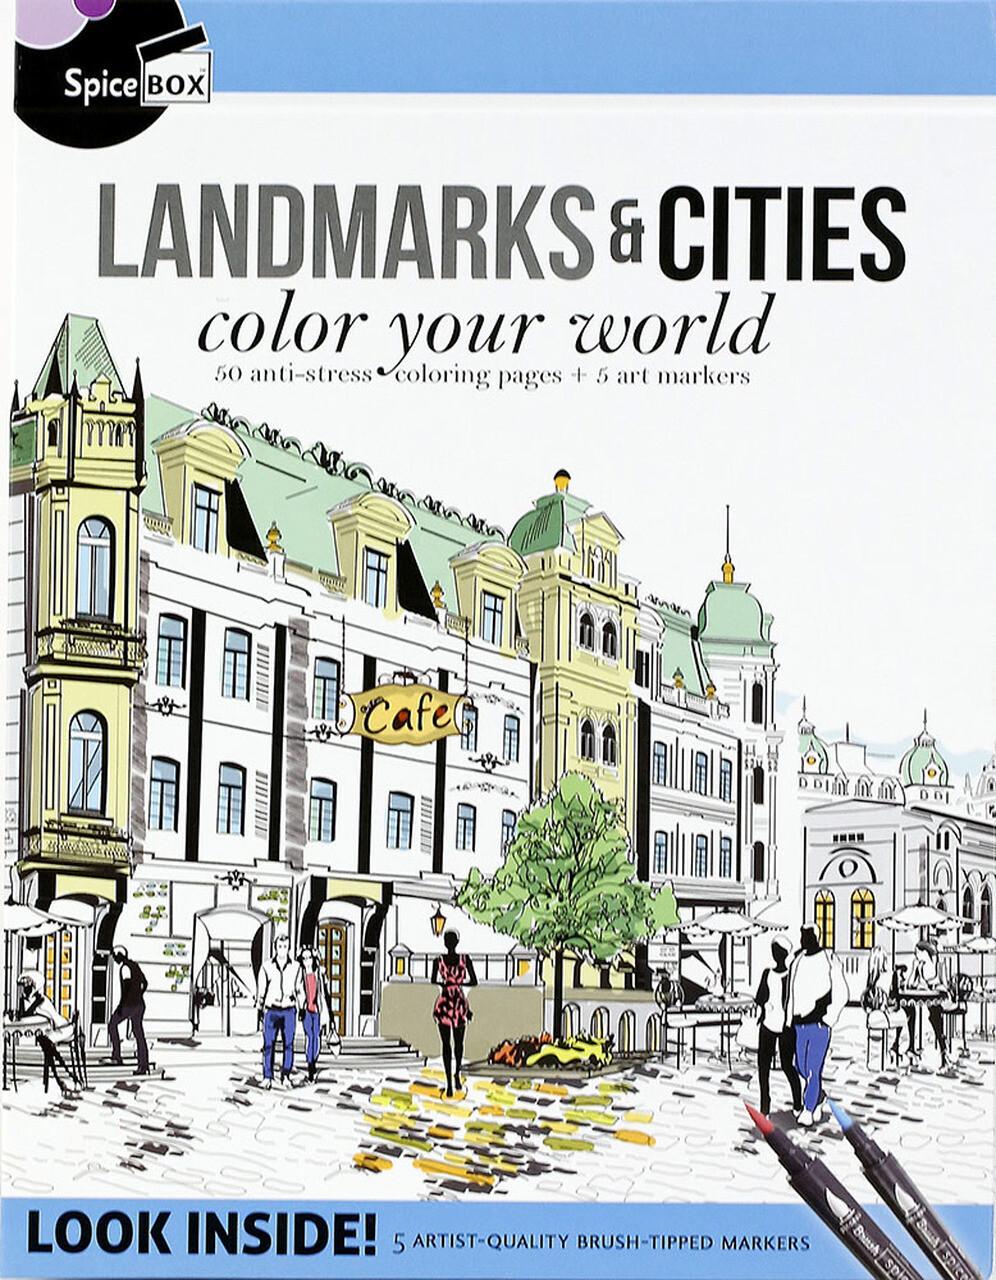 Spice Box; Landmarks & Cities